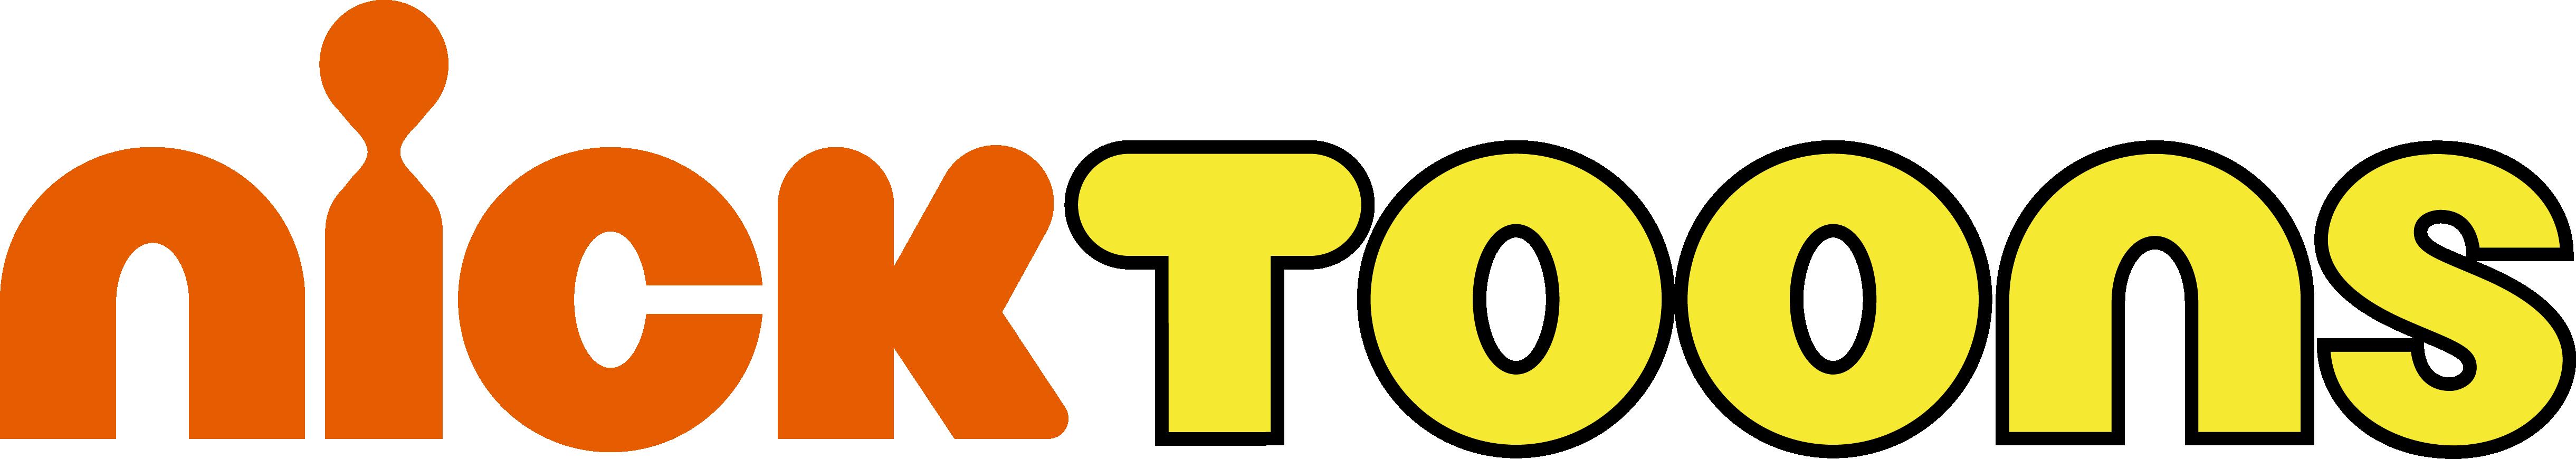 logo Nicktoons